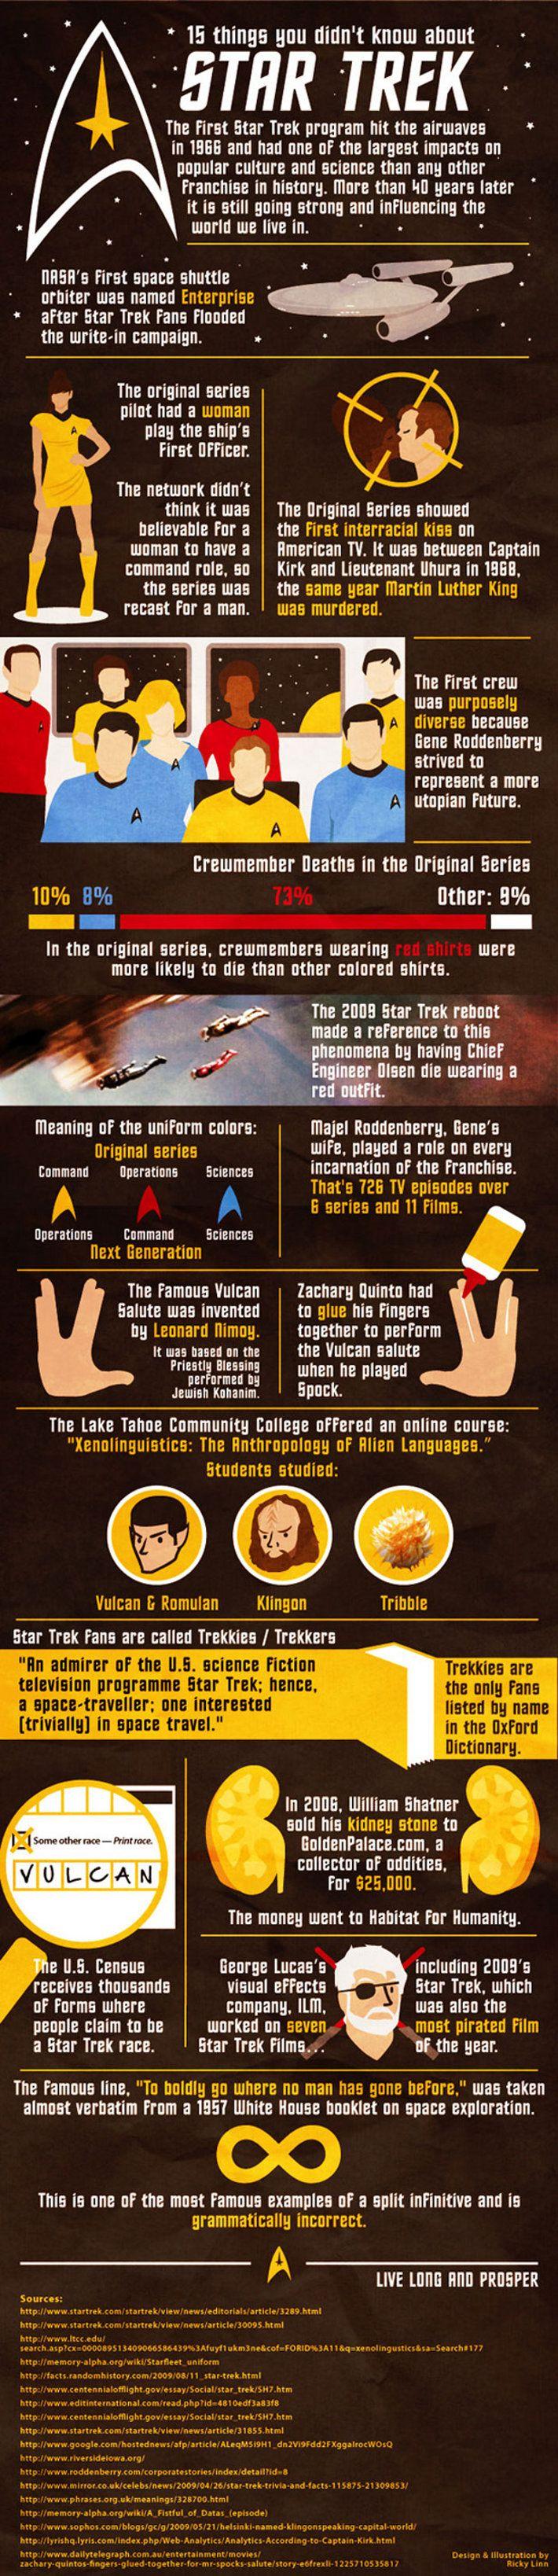 15 cosas que seguramente no sabías de Star Trek